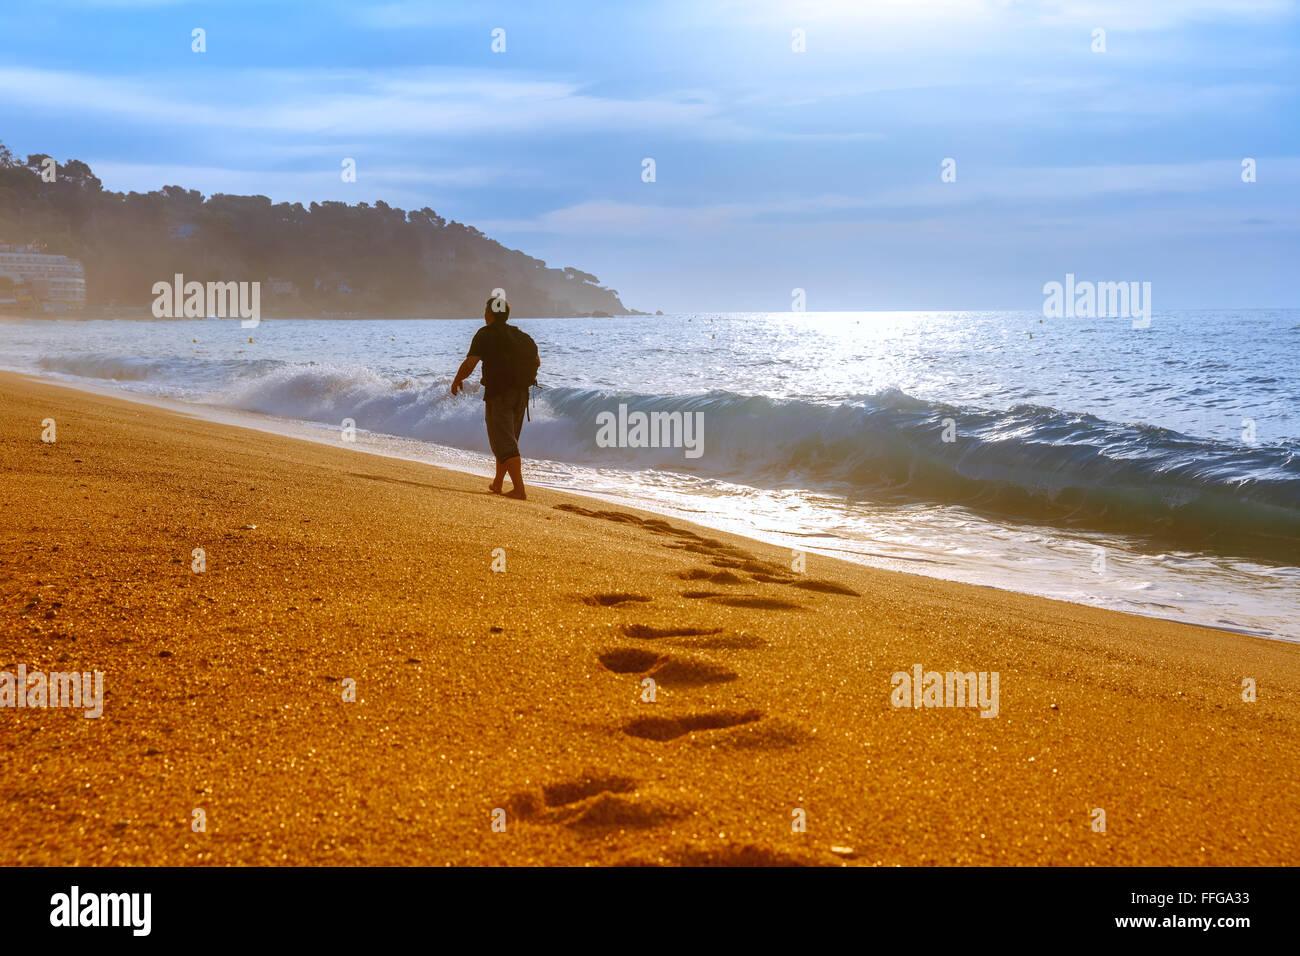 Lloret de Mar, sur la Costa Brava, Catalogne, Espagne Photo Stock d68ecca9a549